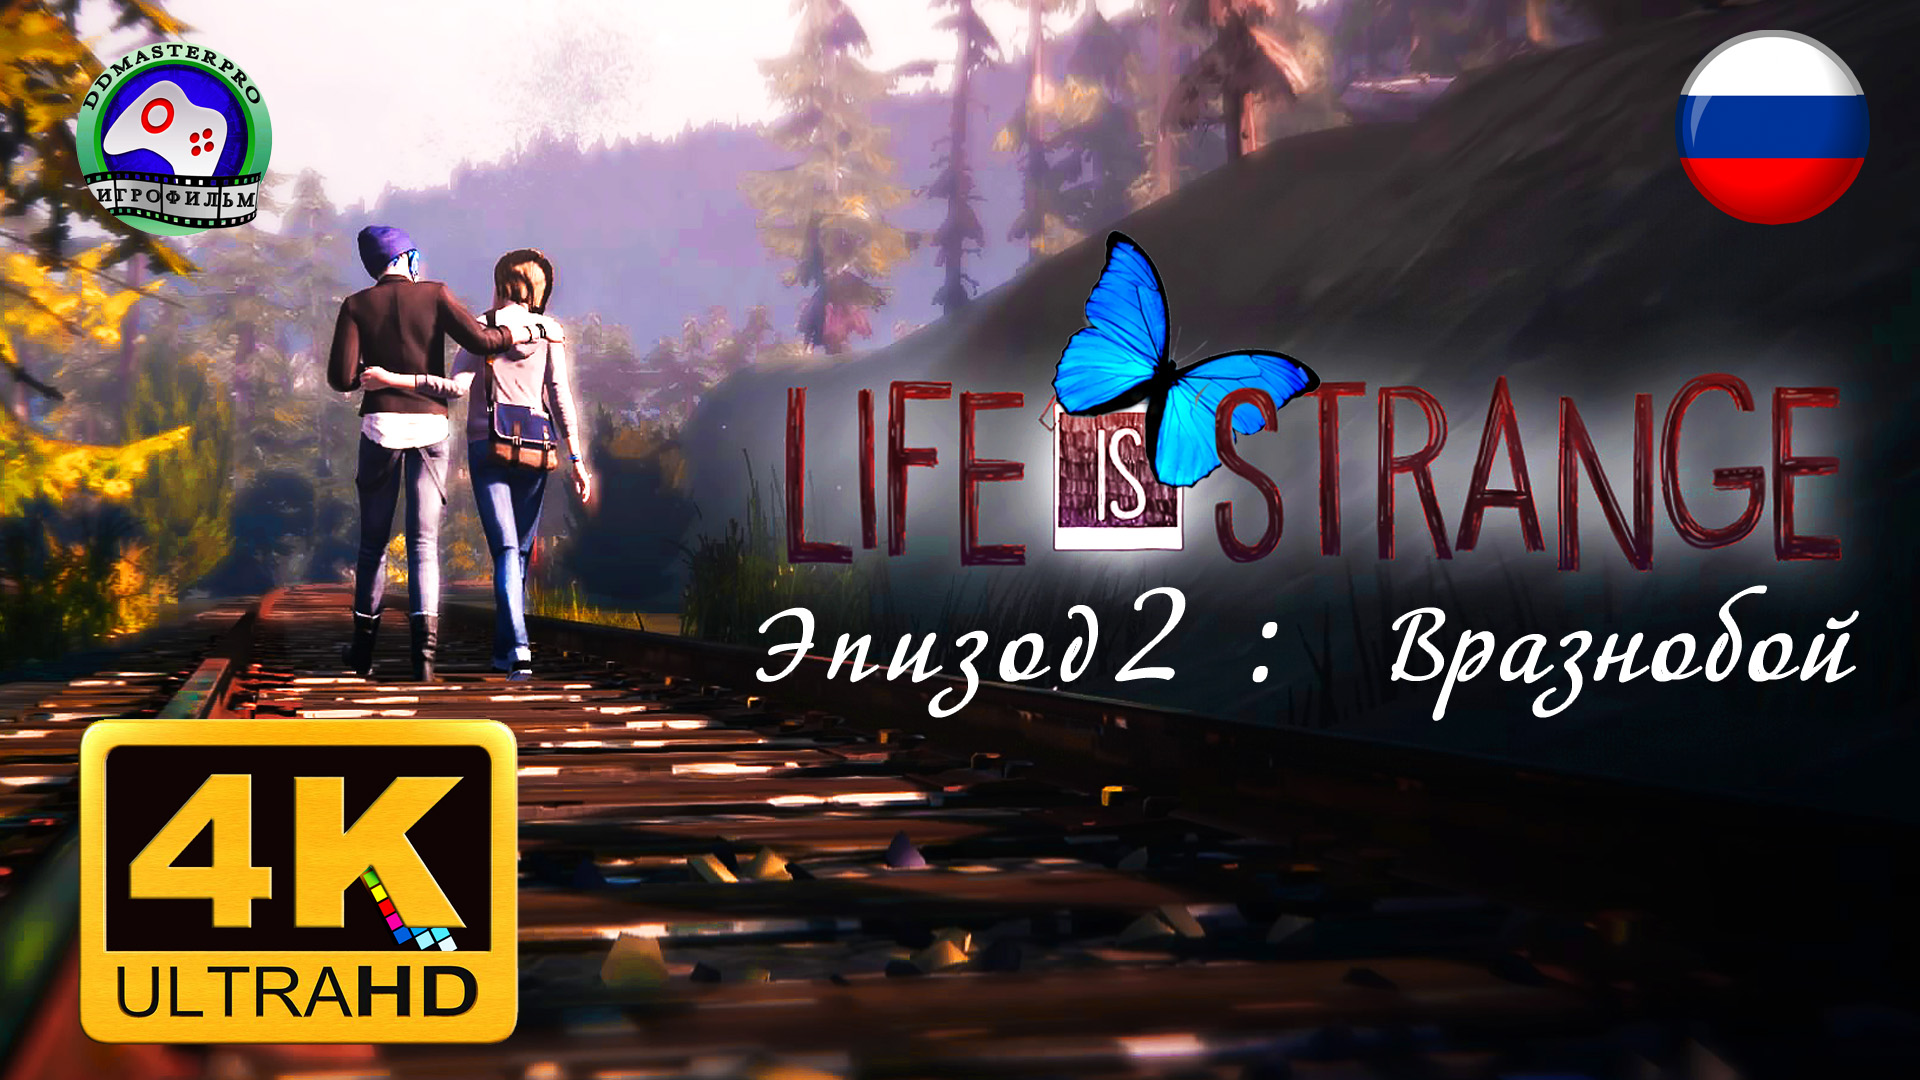 Life is Strange Эпизод 2 Вразнобой ИГРОФ